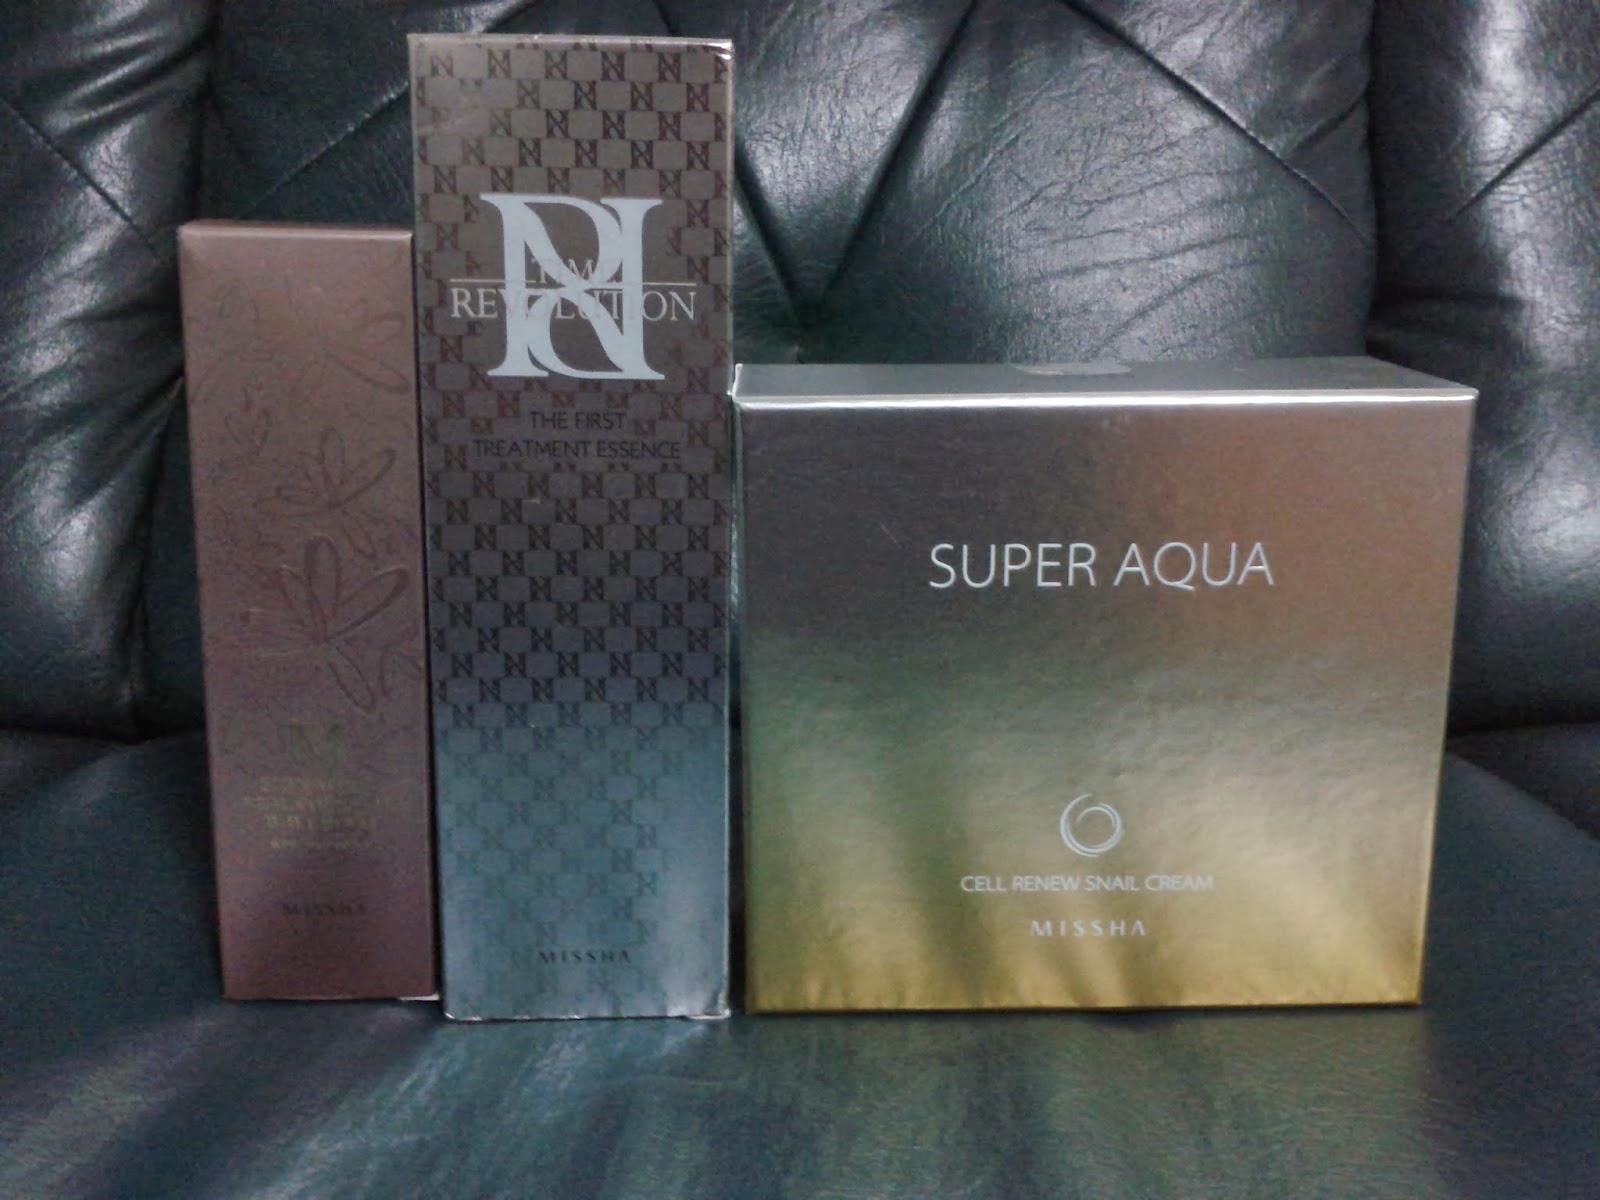 Pas-sosyal: Review: Missha Super Aqua Cell Renew Snail Cream